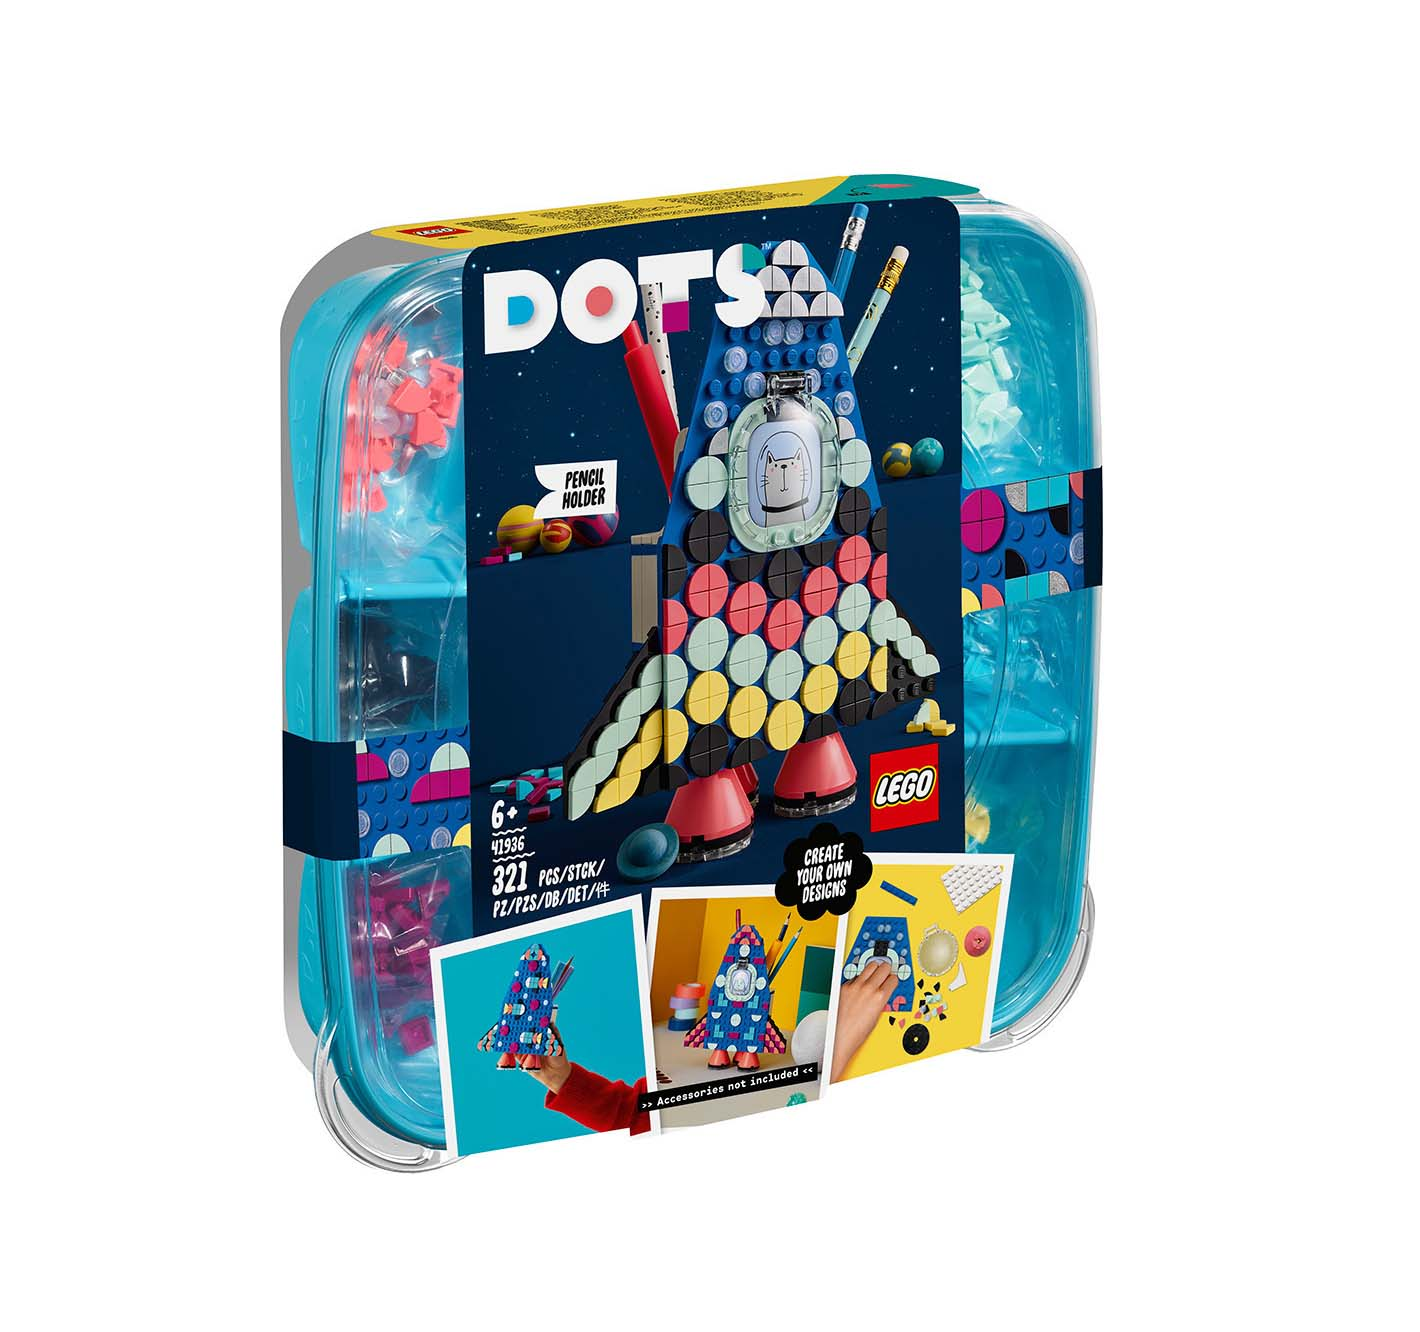 Lego Dots: Pencil Holder 41936